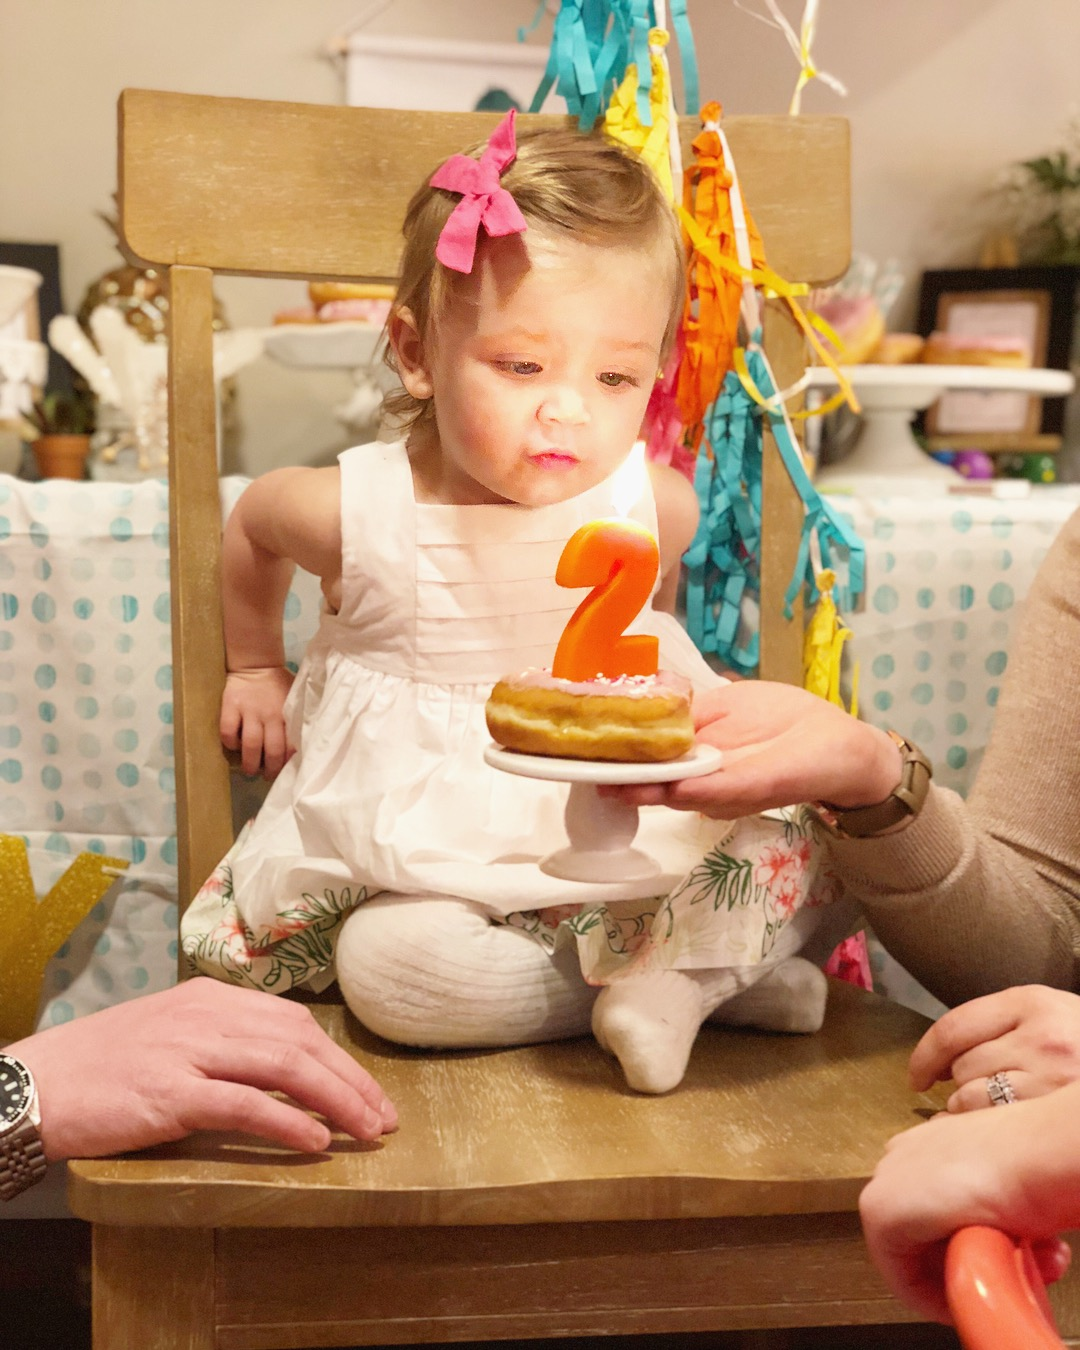 Sophie's cake